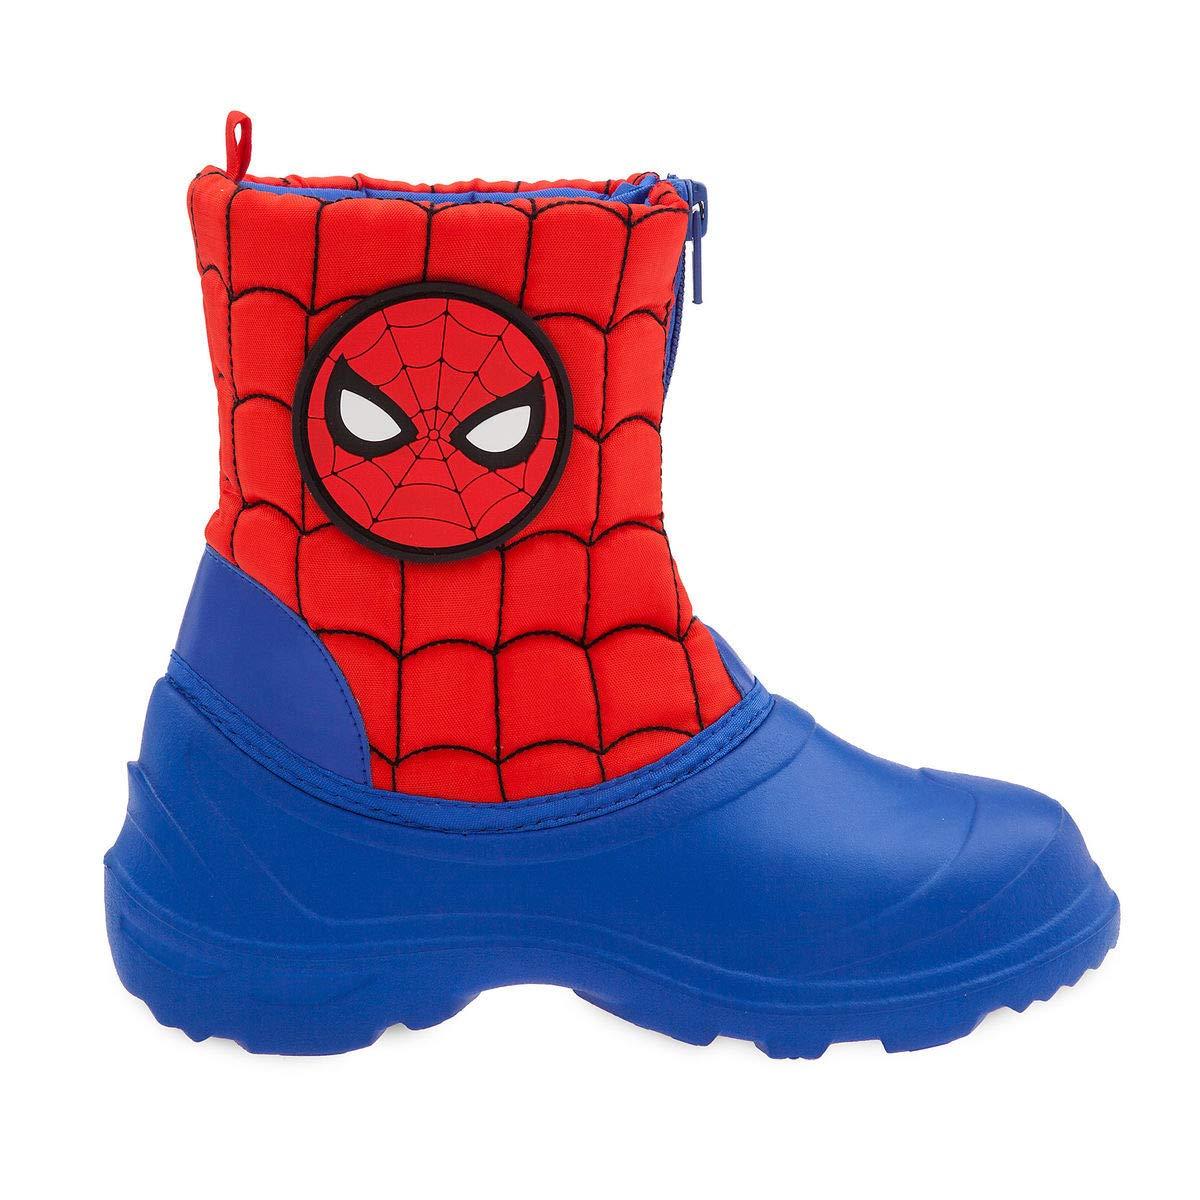 Marvel Spider-Man Rain Boots for Kids